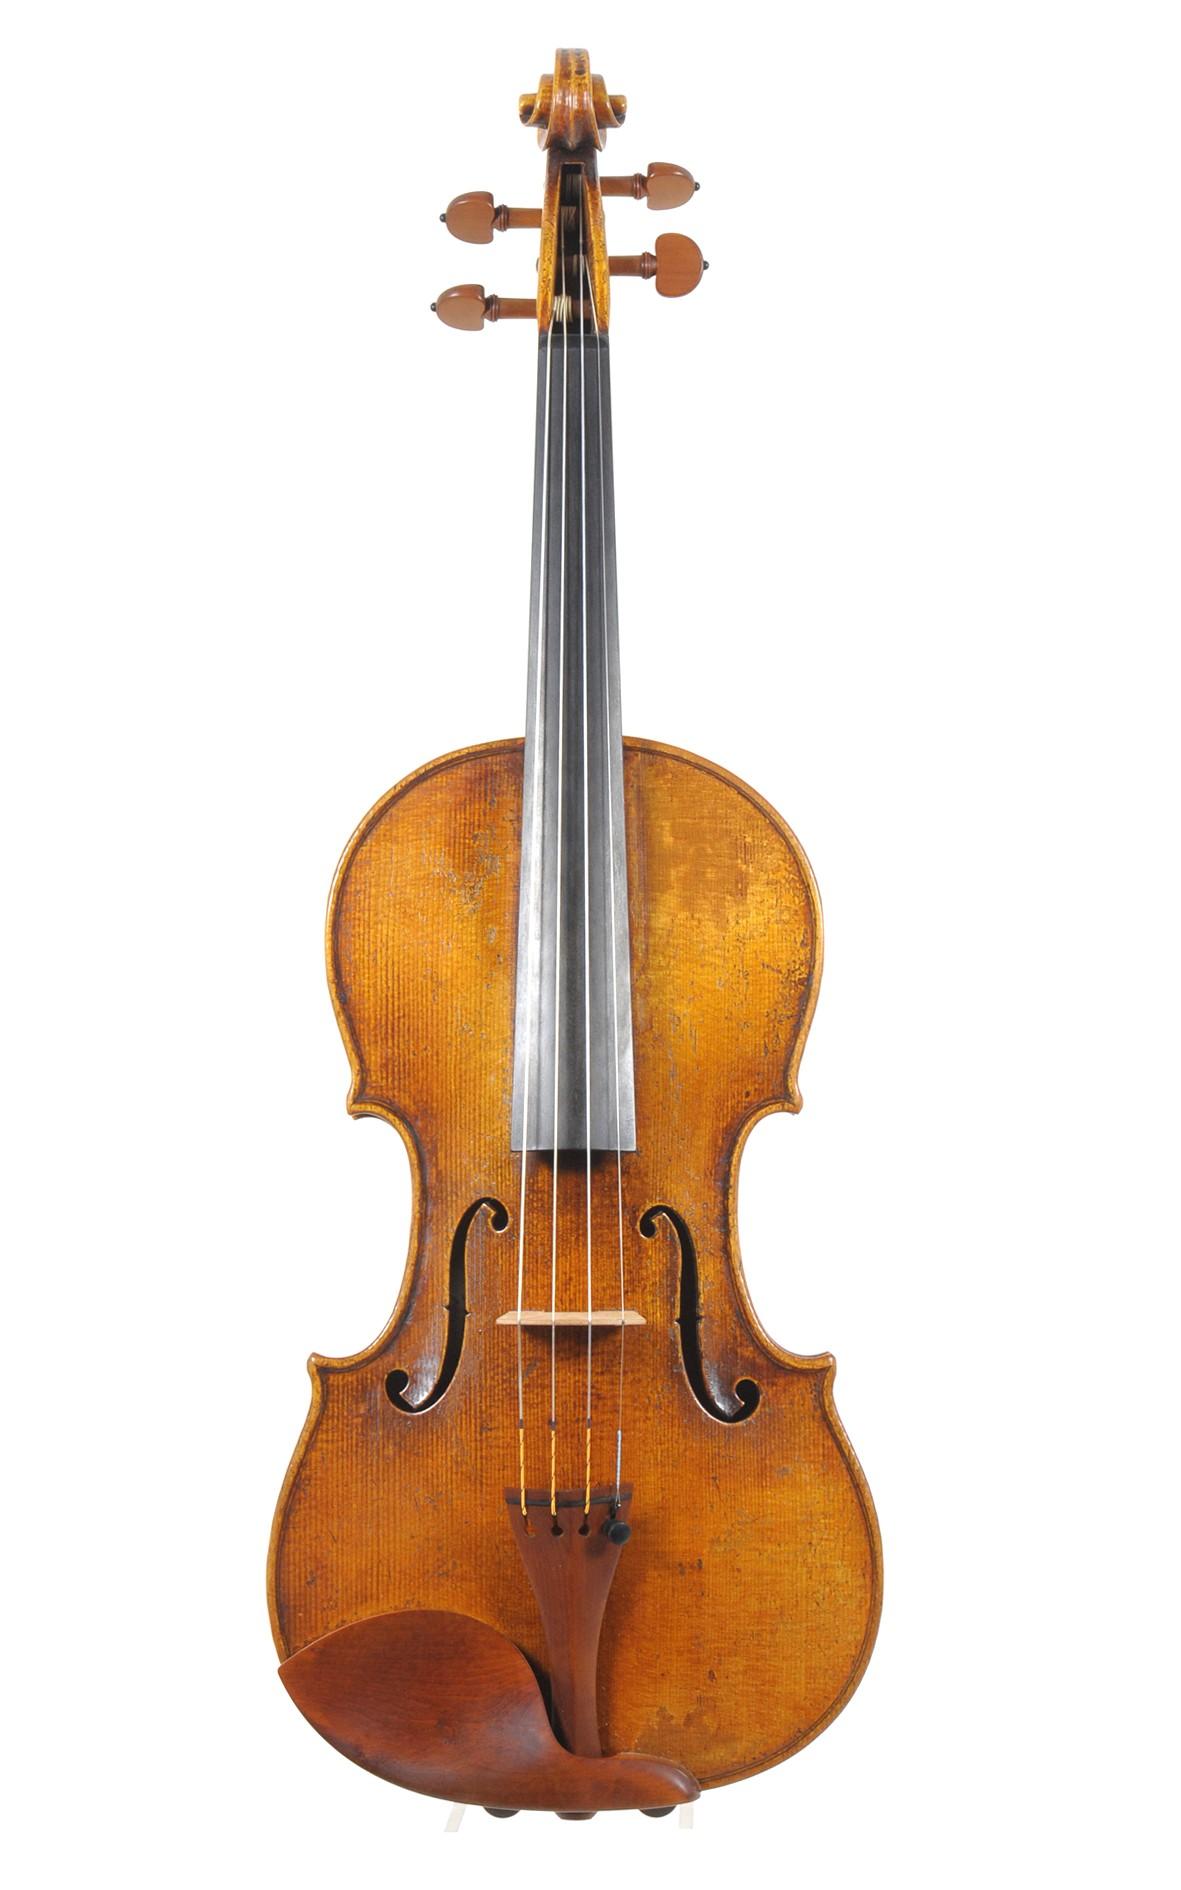 Violin by Christian Lijsen, Munich